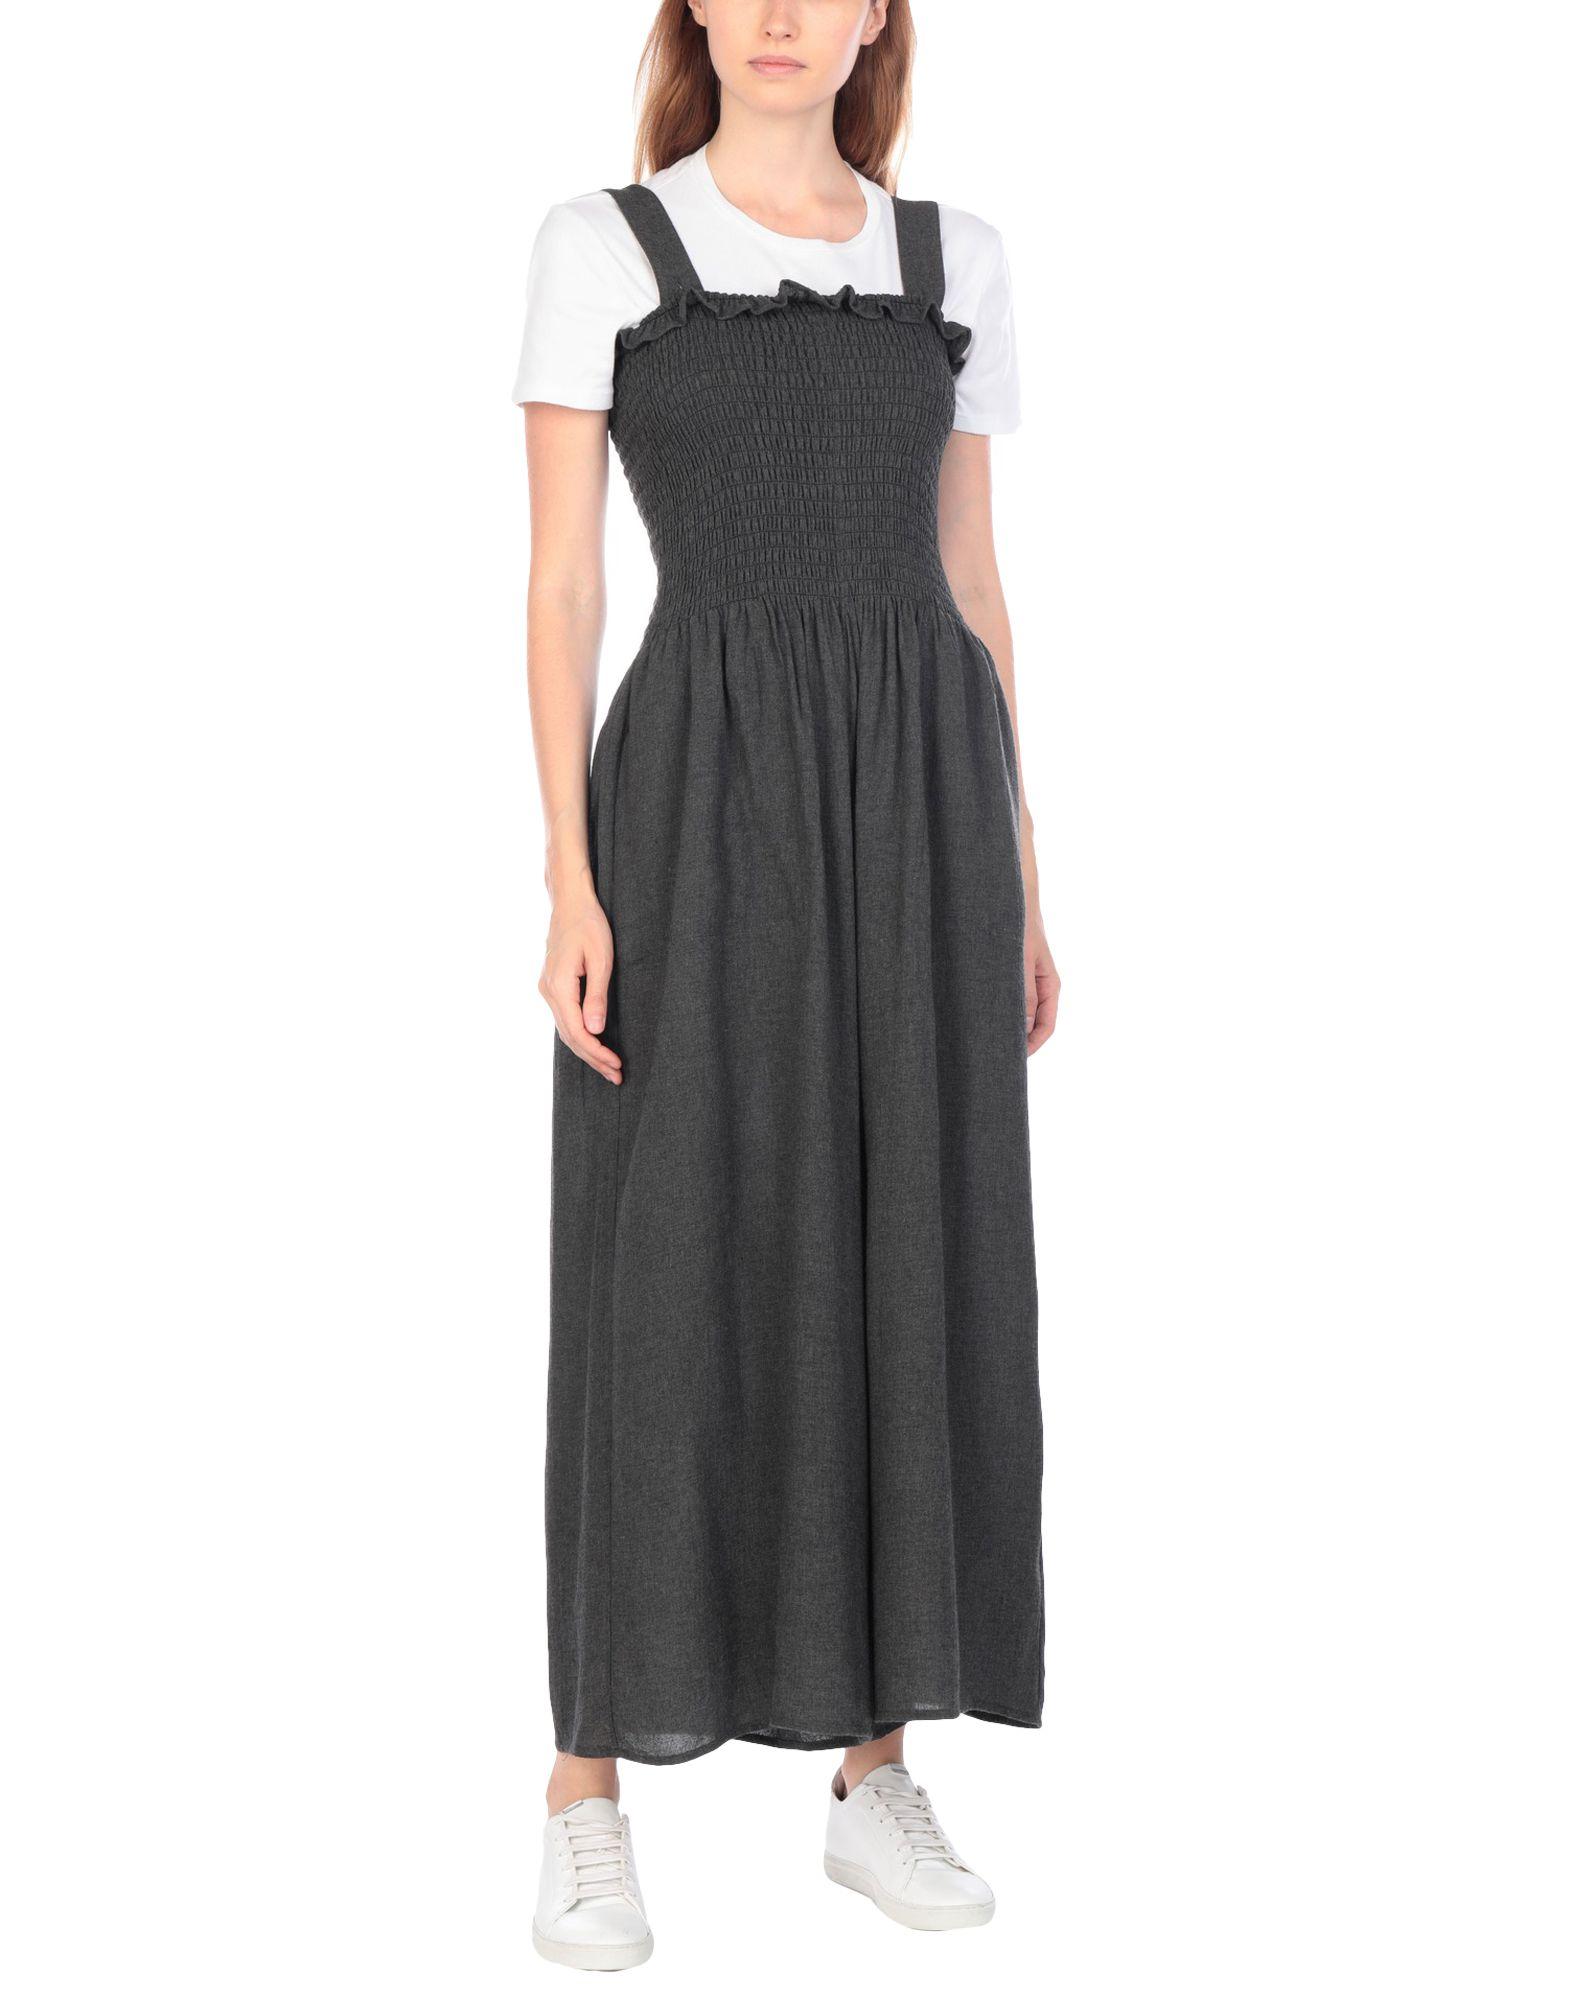 MM6 MAISON MARGIELA Overalls. flannel, frills, basic solid color, deep neckline, sleeveless, no pockets. 75% Viscose, 25% Virgin Wool